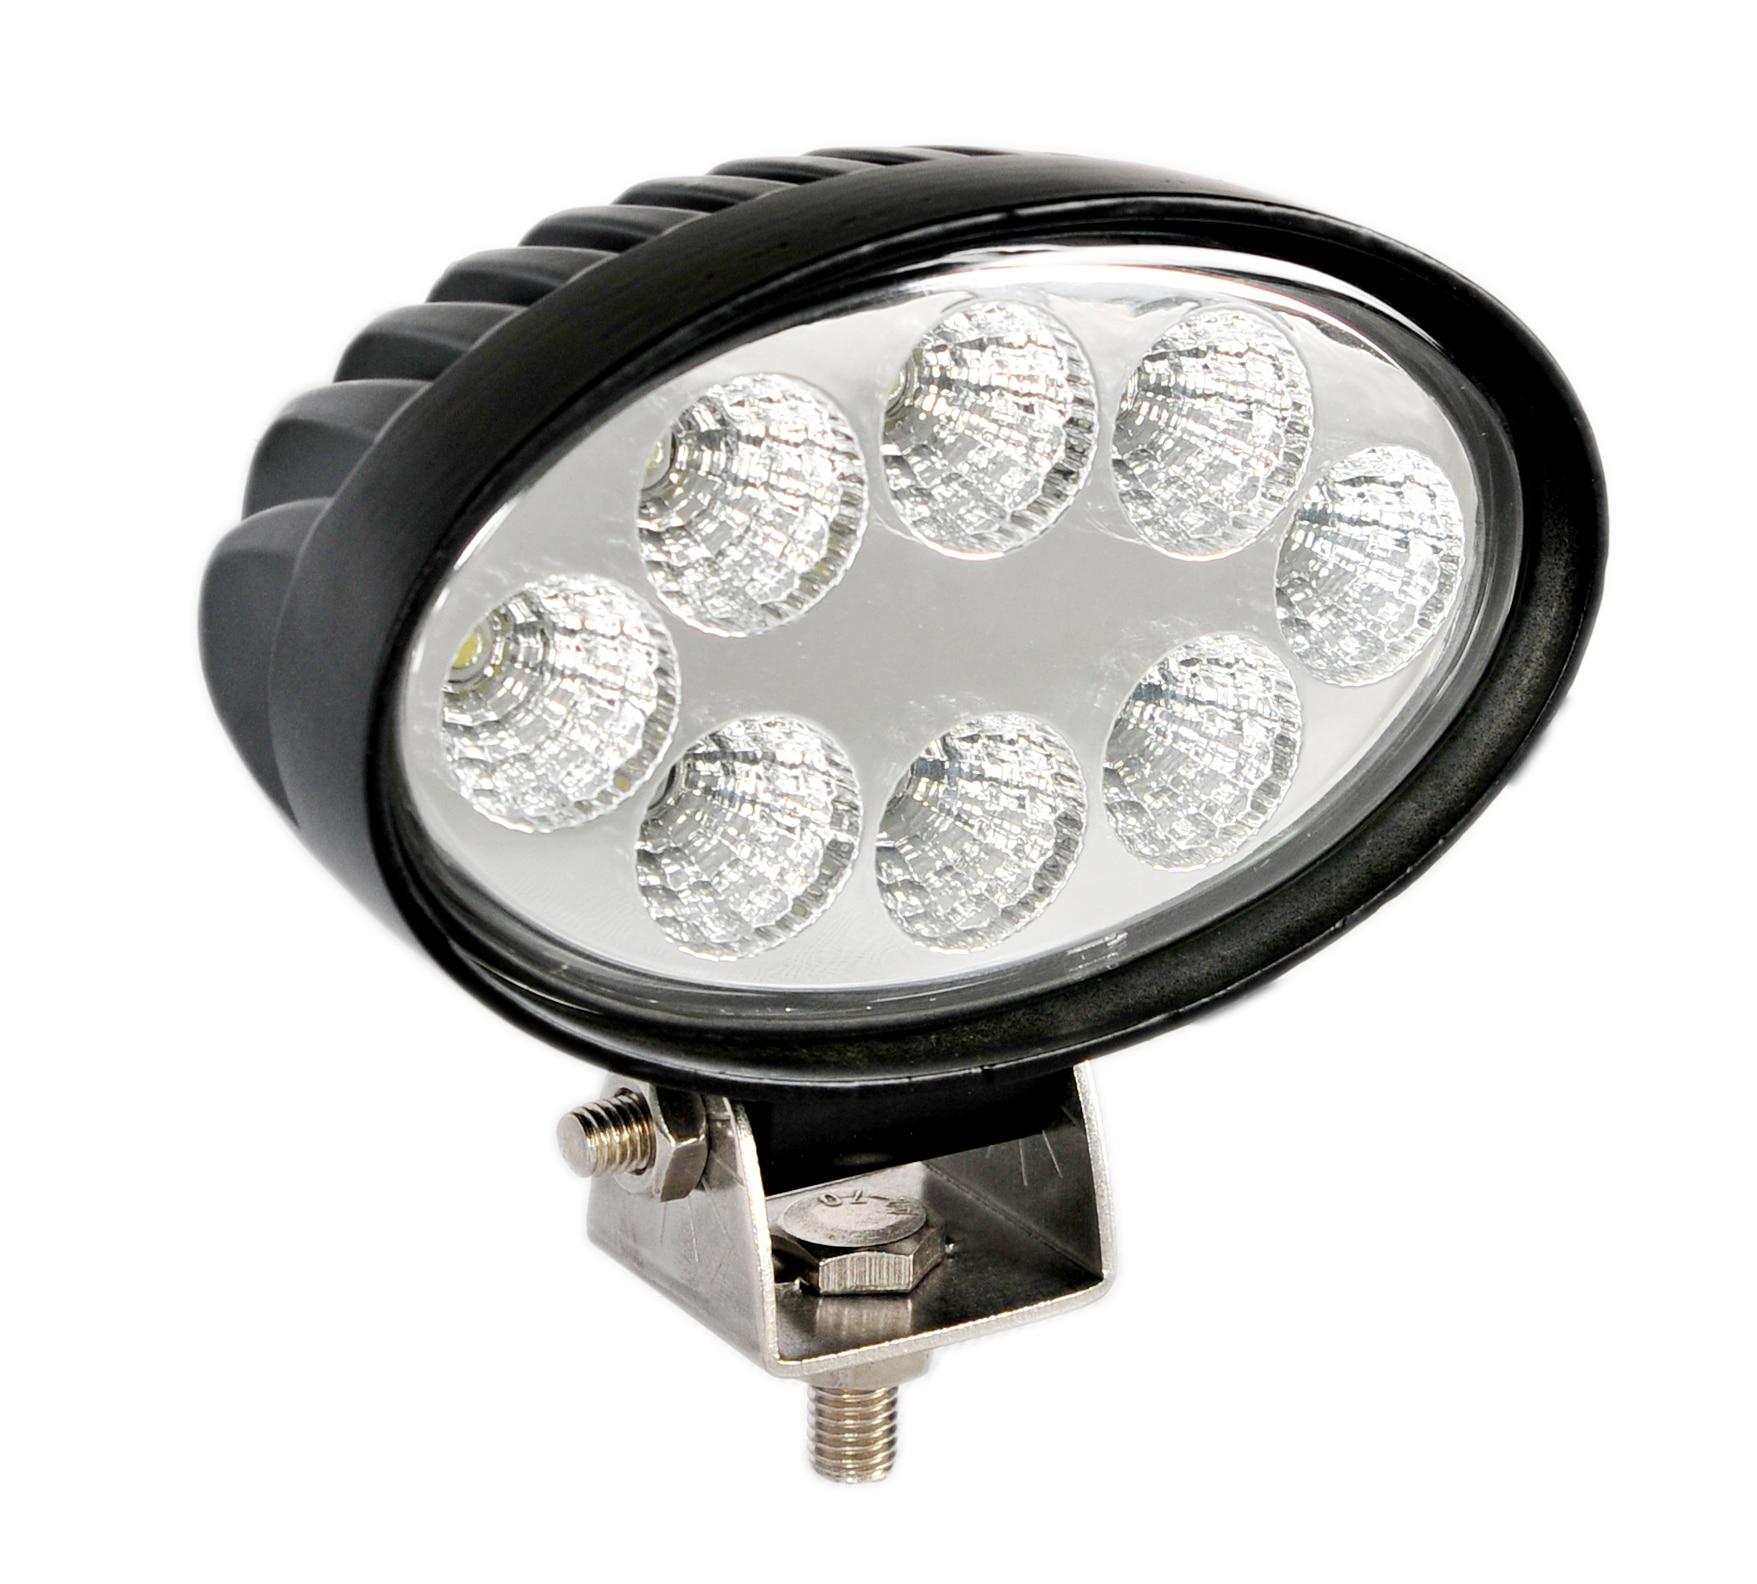 "ECAHAYAKU 1PCS LED Work Light 40W IP68 6000K Flood Beam 5.5"" Light Bar for Jeep Off-road ATV SUV Trucks Boats Fog Lights Car 4x4"